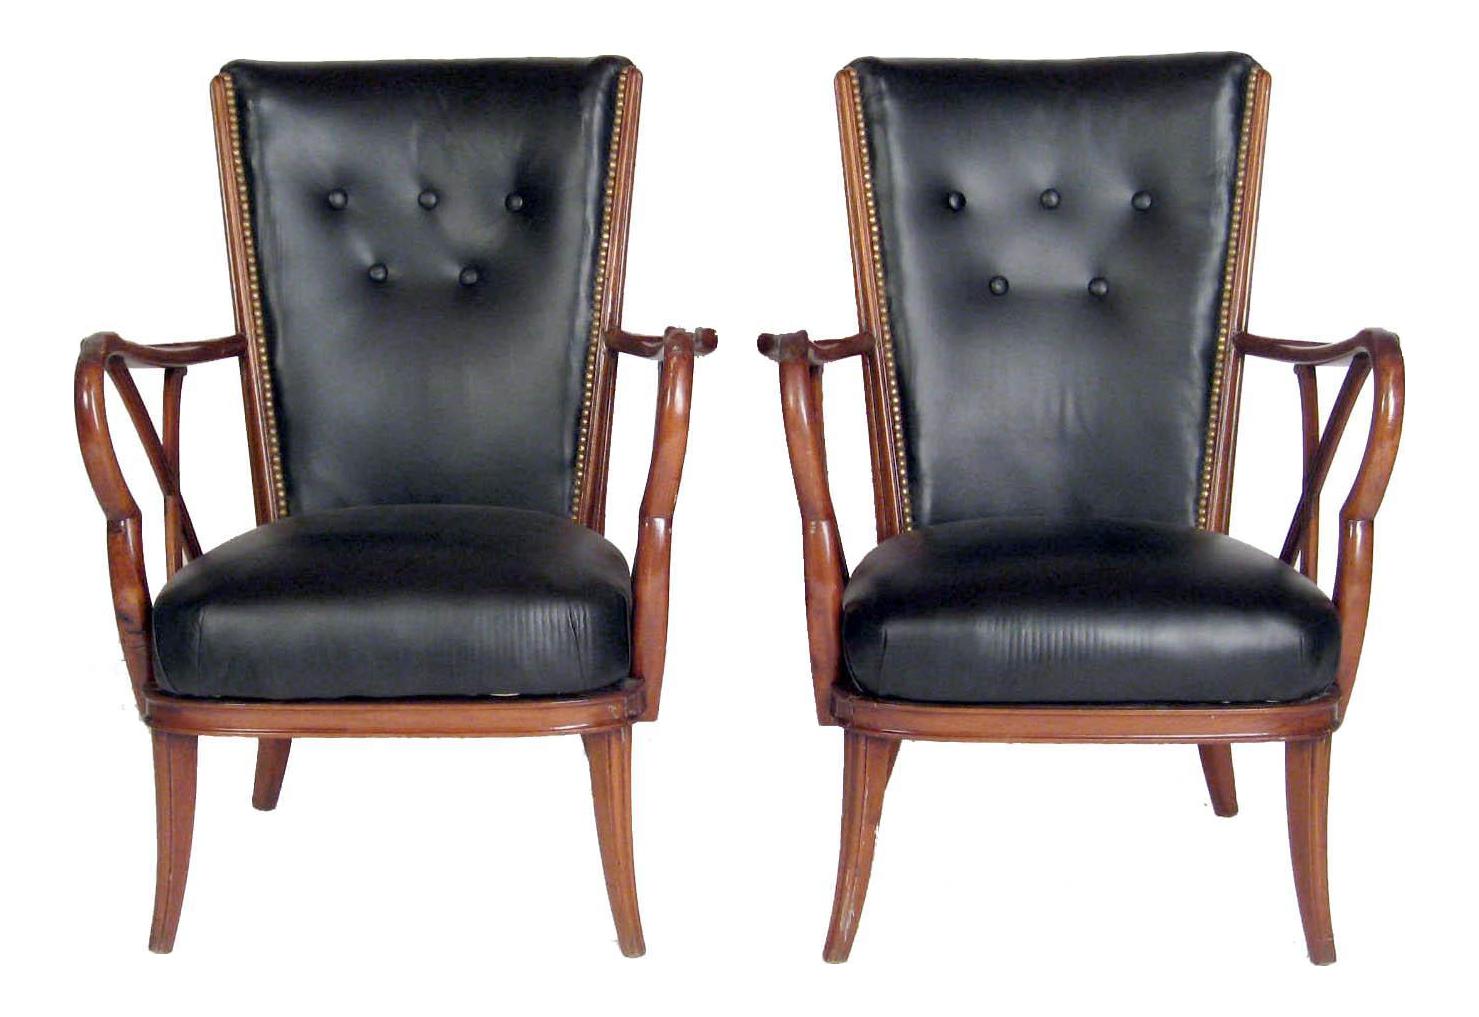 Vintage Mid Century Black Leather U0026 Nailhead Accent Chairs   Pair